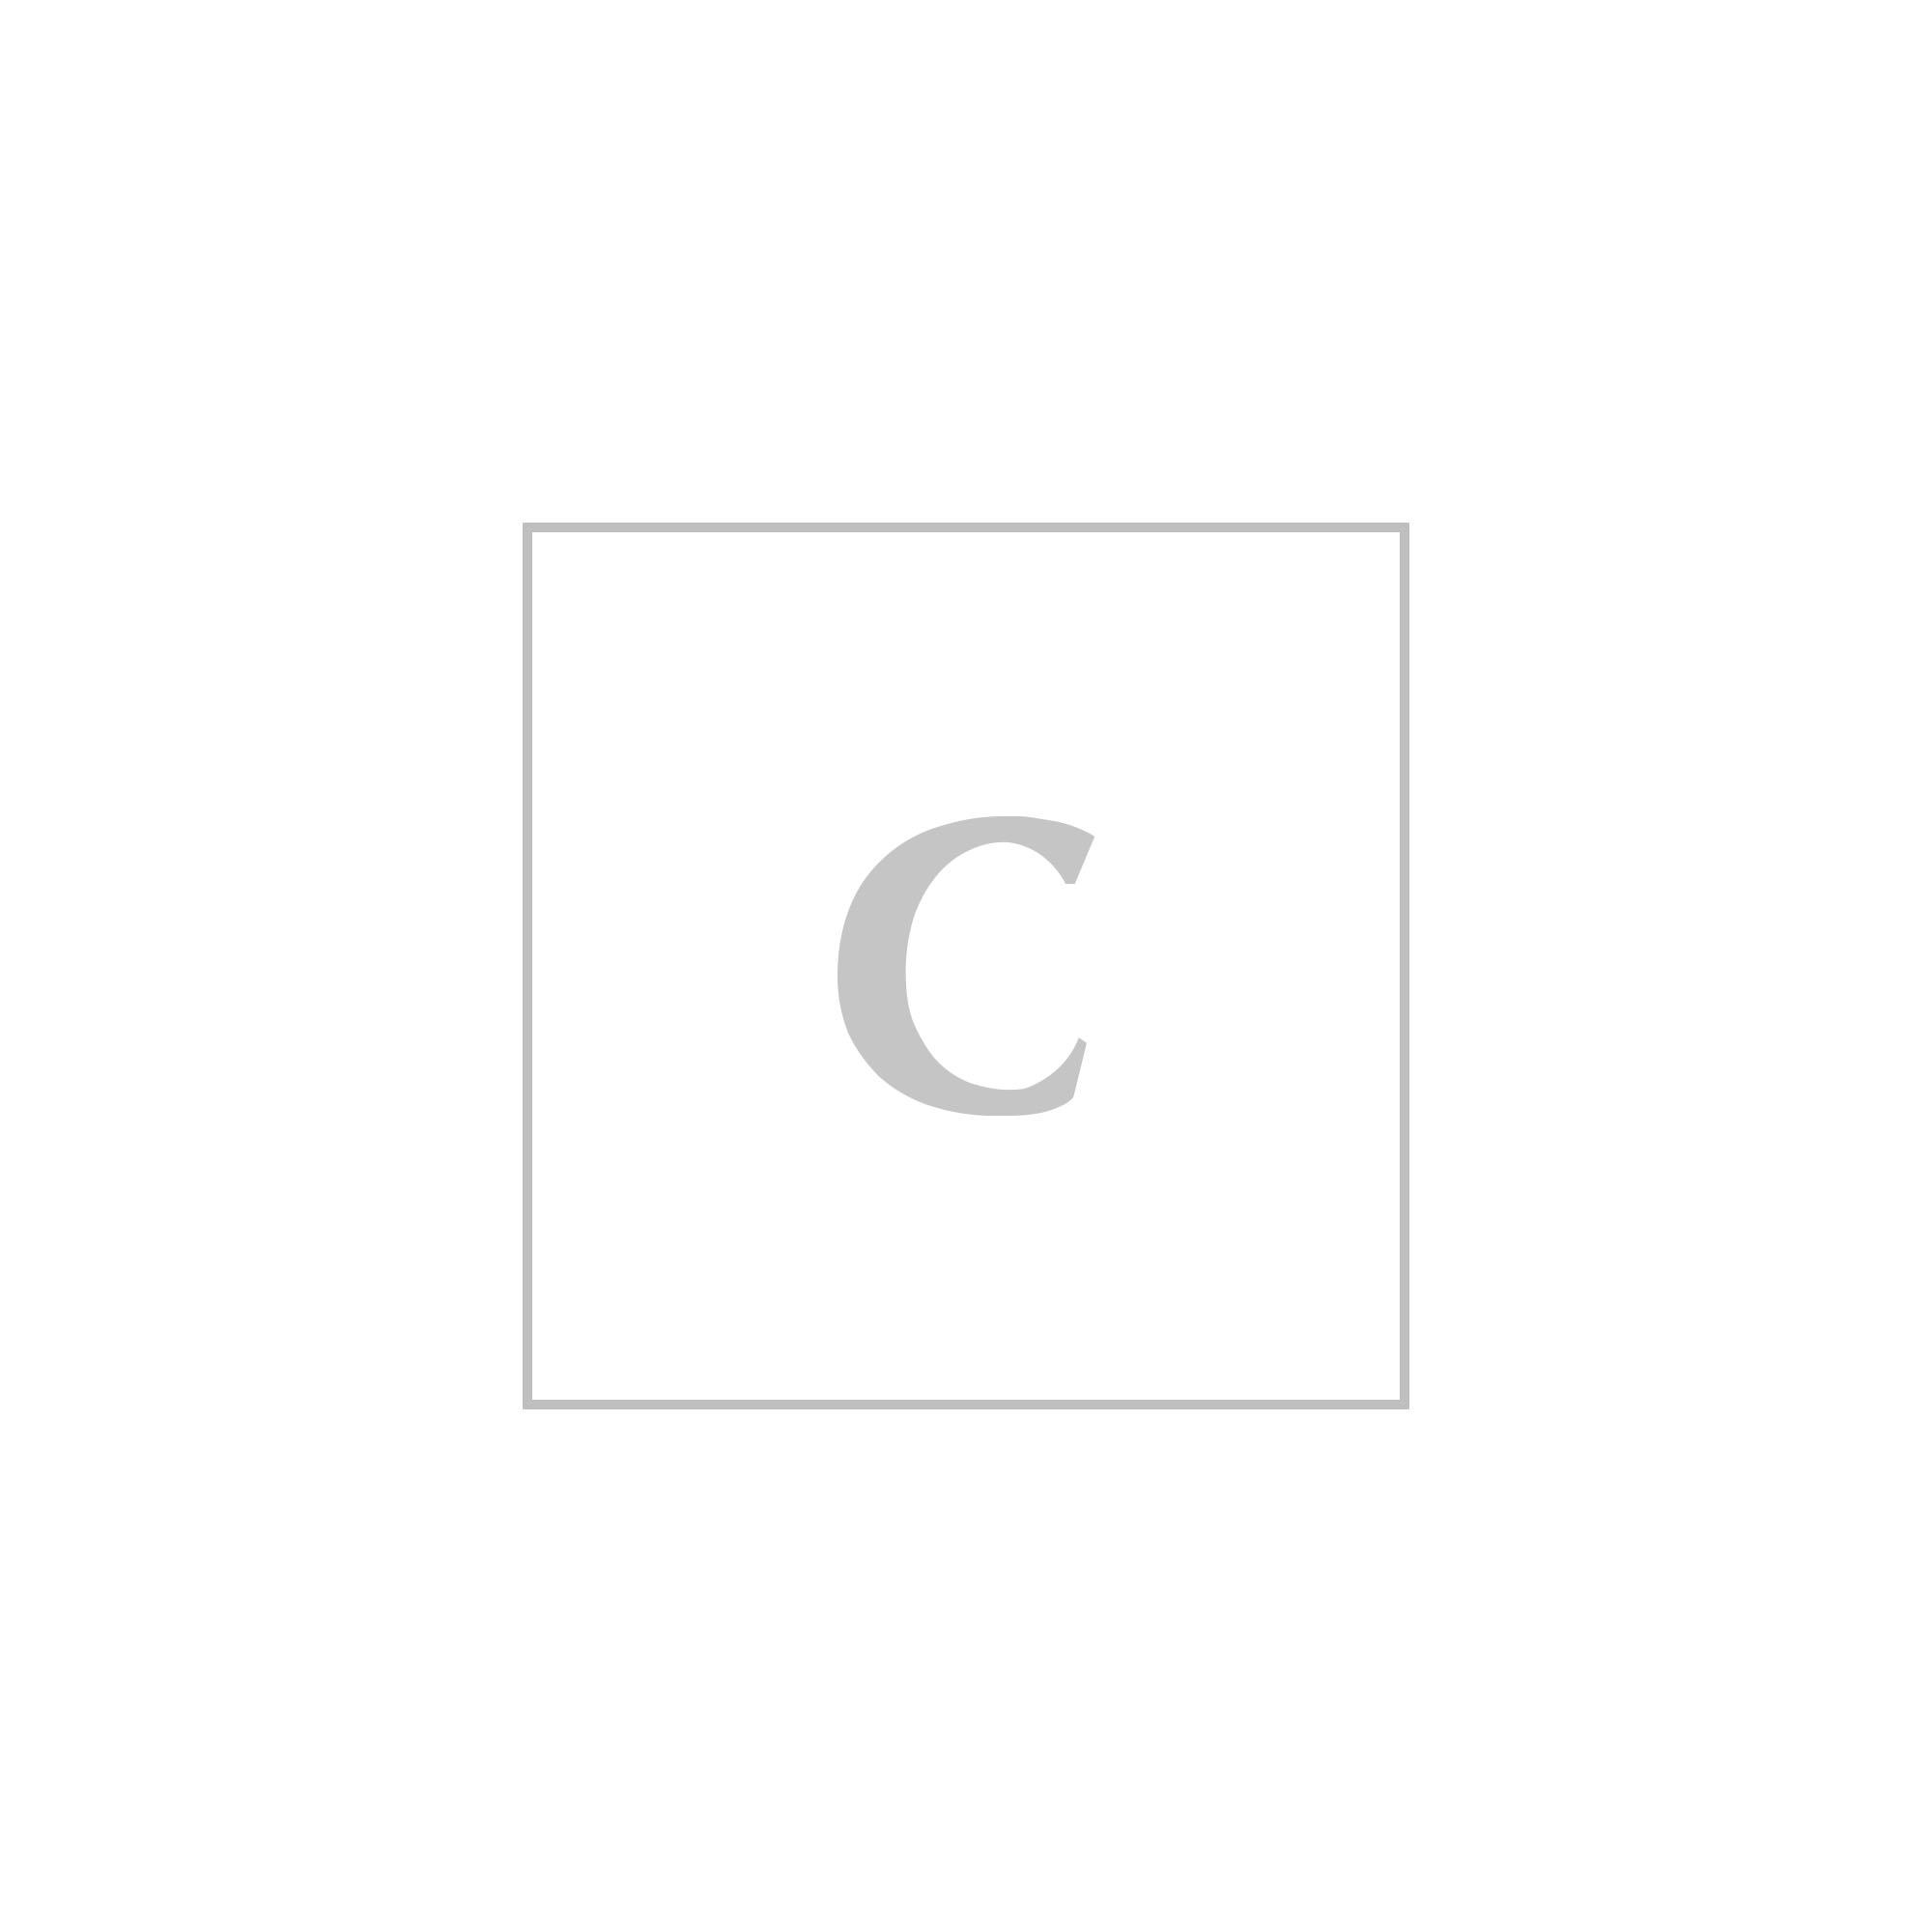 Gcds logo t-shirt